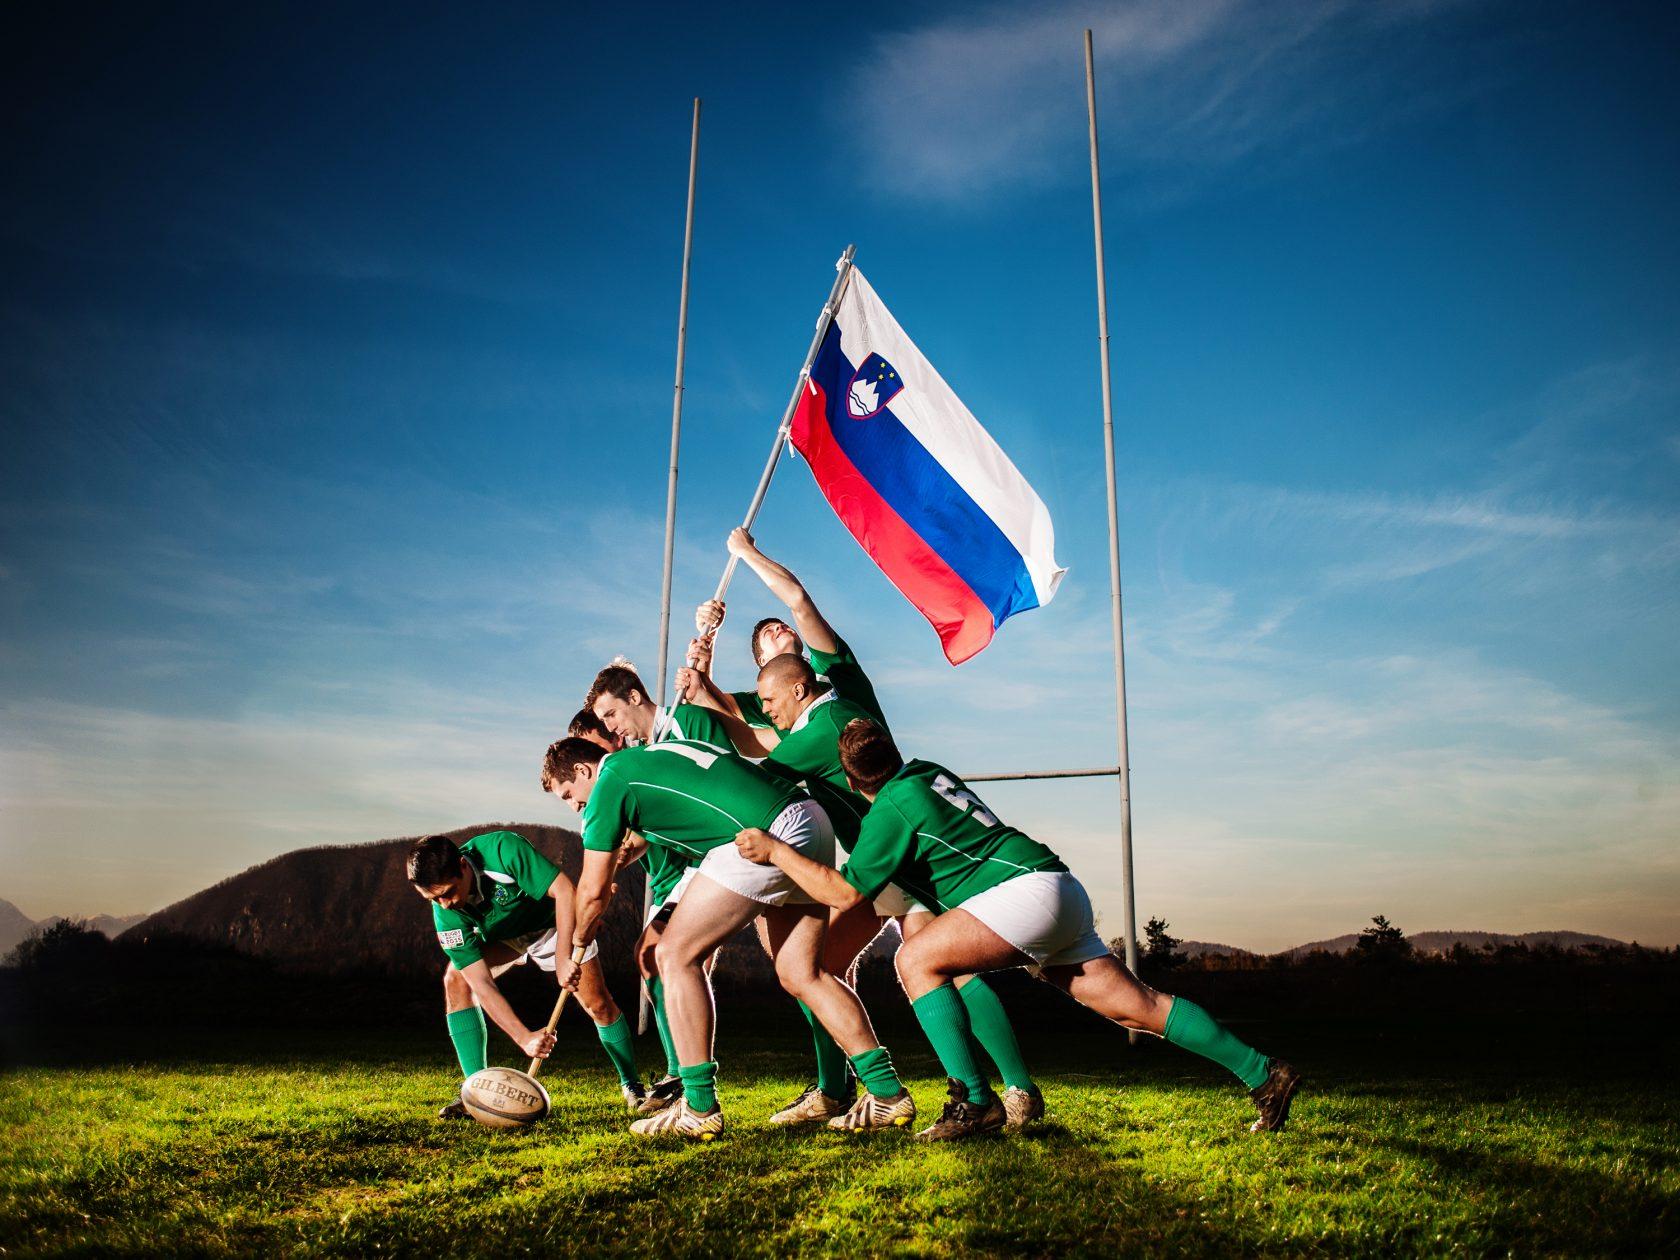 rugby_slovenija_foto_luka_gorjup-e1464336282359